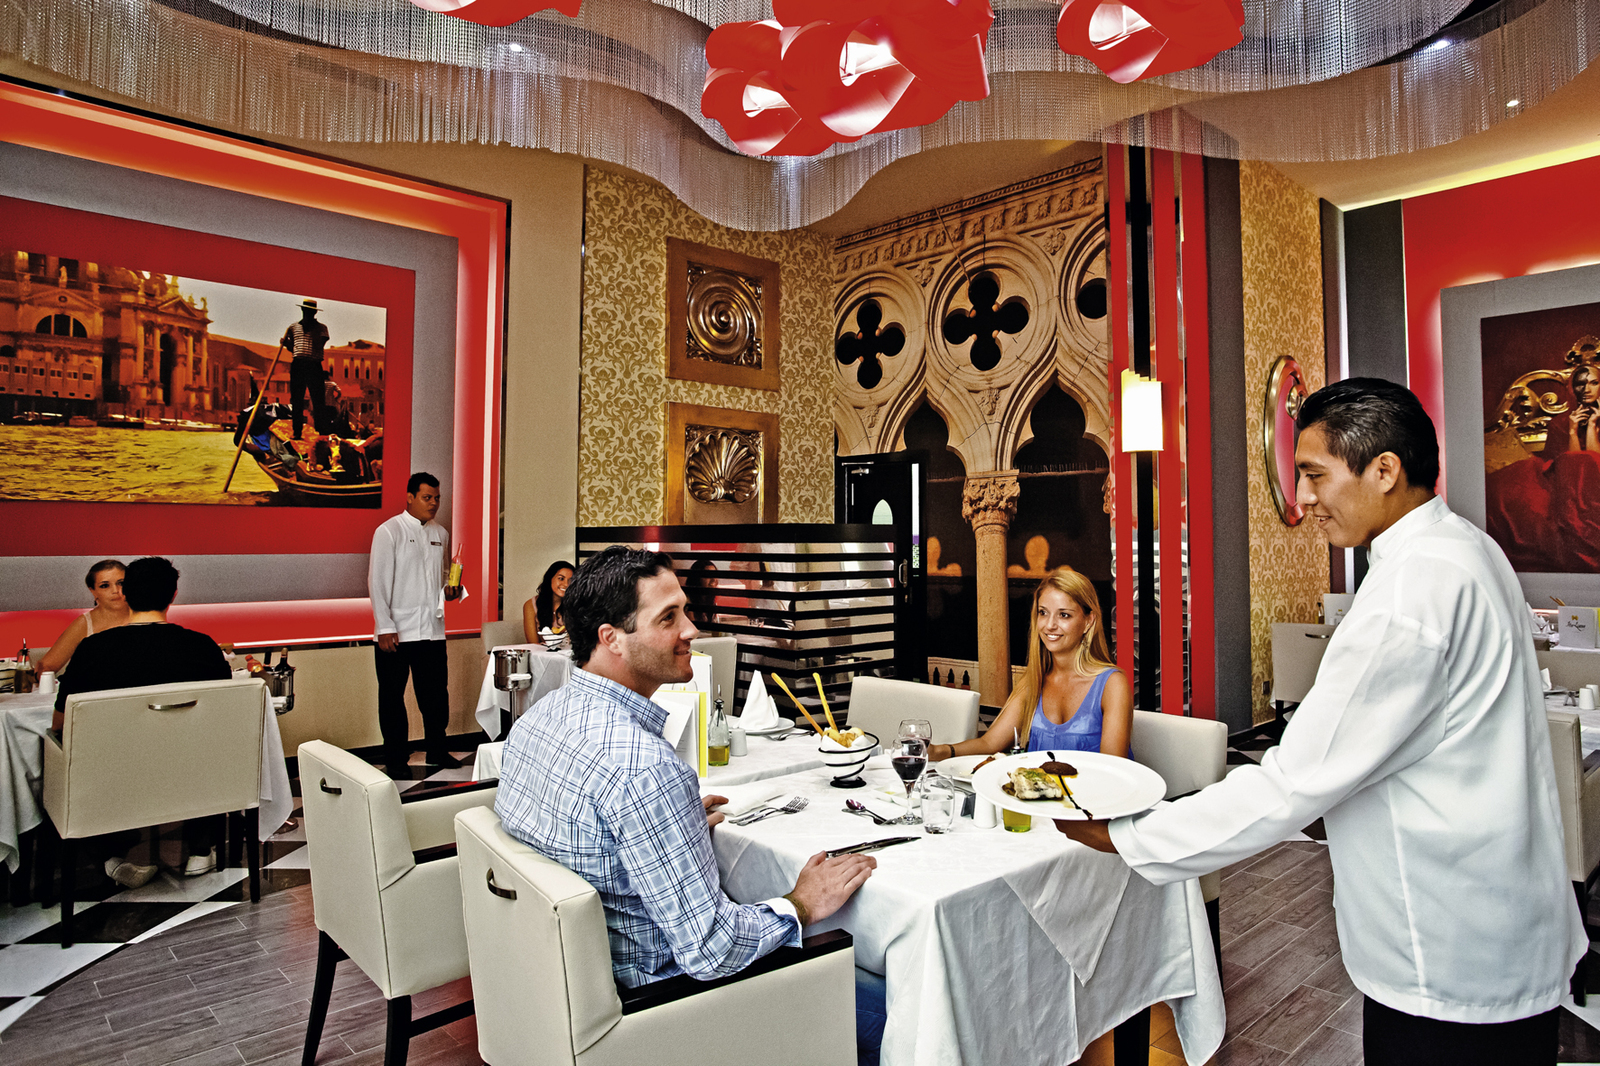 riu palace mexico ihr riu hotels spezialist tourent reisen gmbh rather 40476. Black Bedroom Furniture Sets. Home Design Ideas